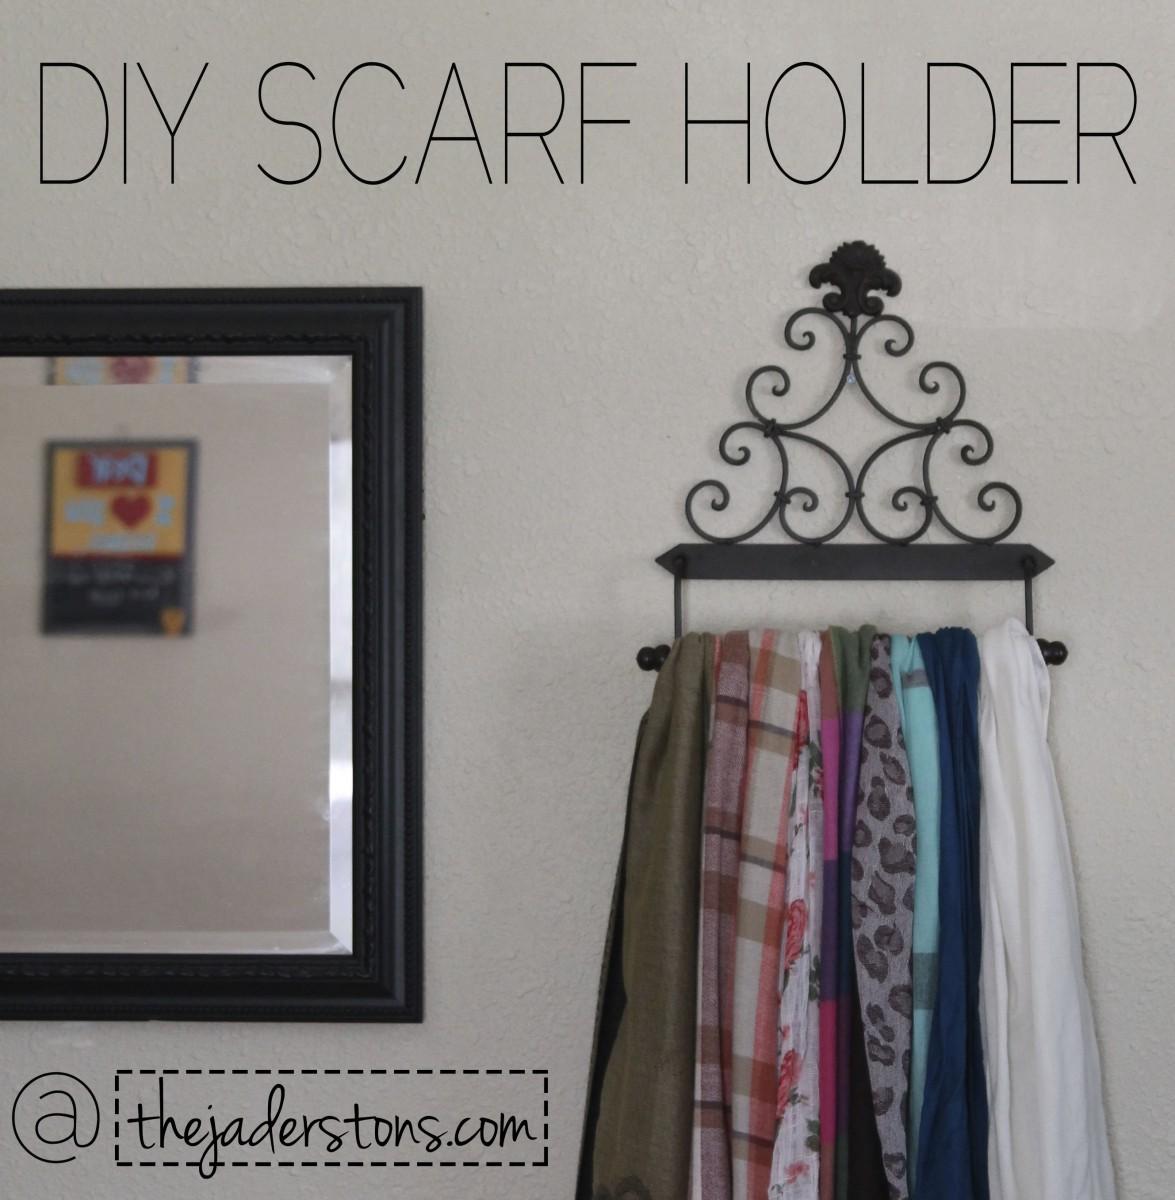 DIY scarf hanger – The Jaderstons